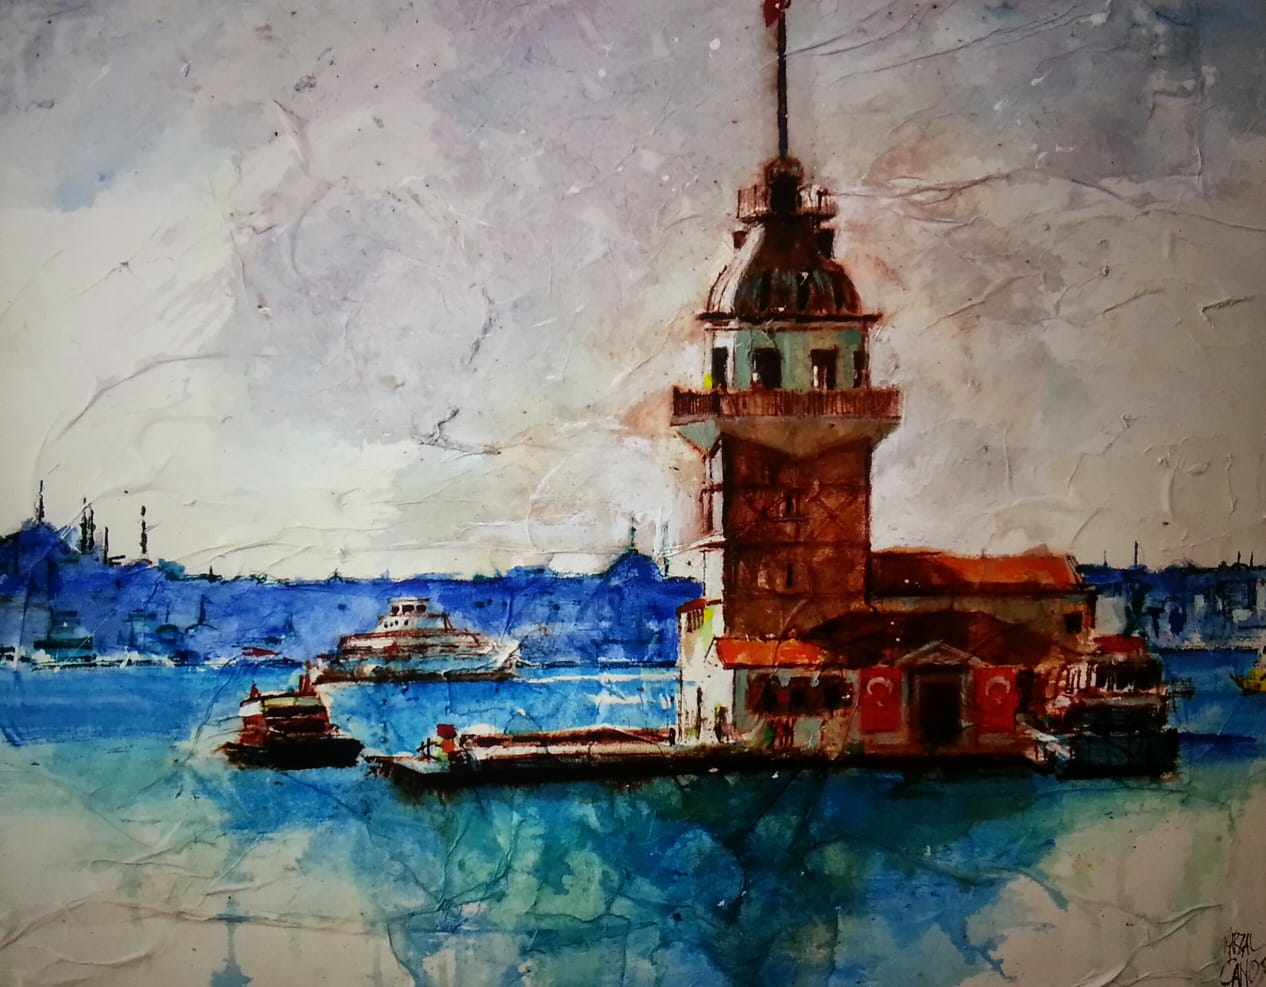 Jaume Marzal Canos İstanbul'a Bir Bakış Sergisi